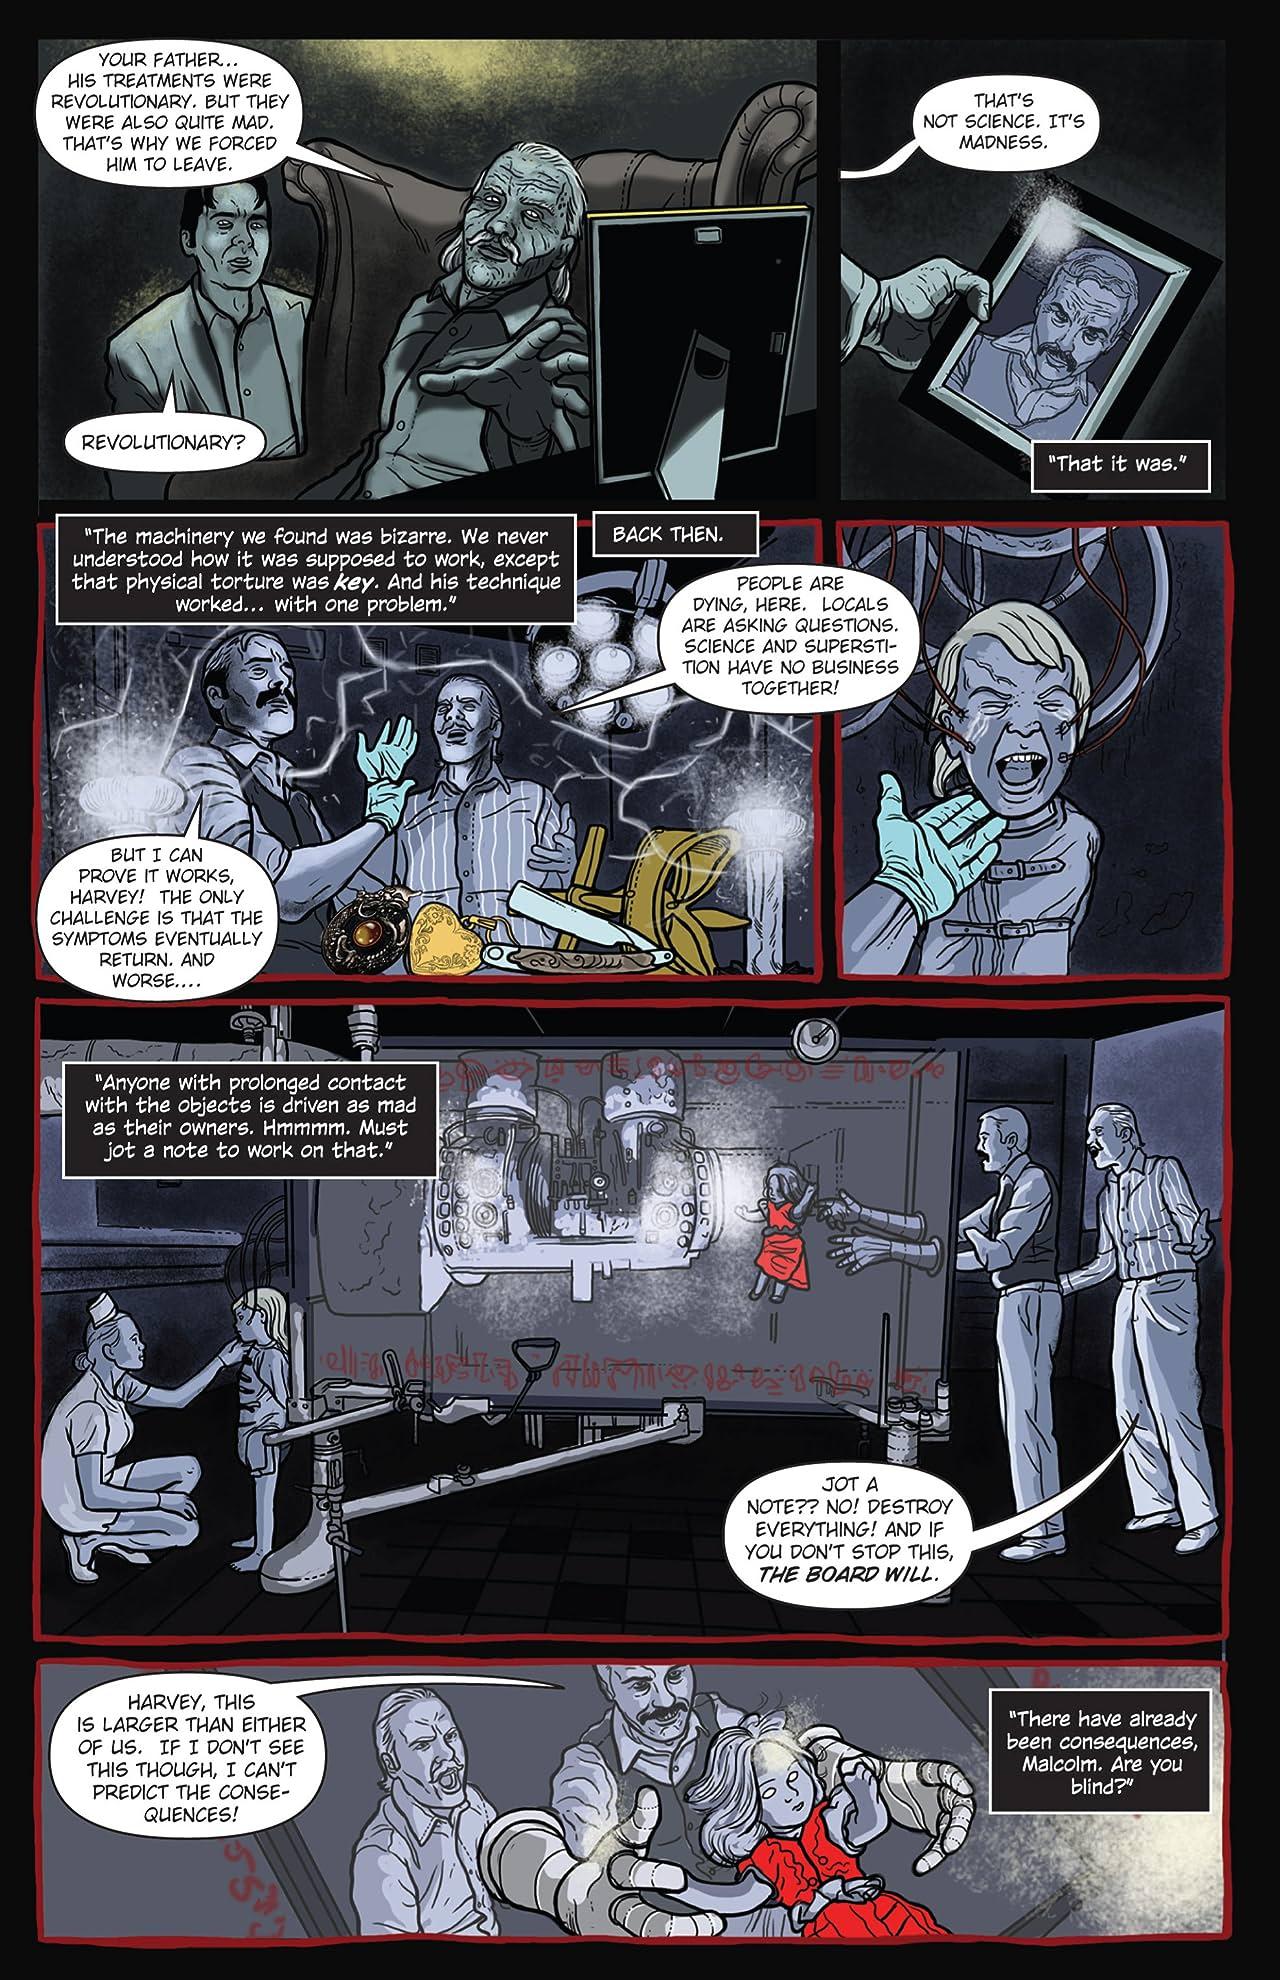 John Saul Presents The Blackstone Chronicles #4 (of 4)